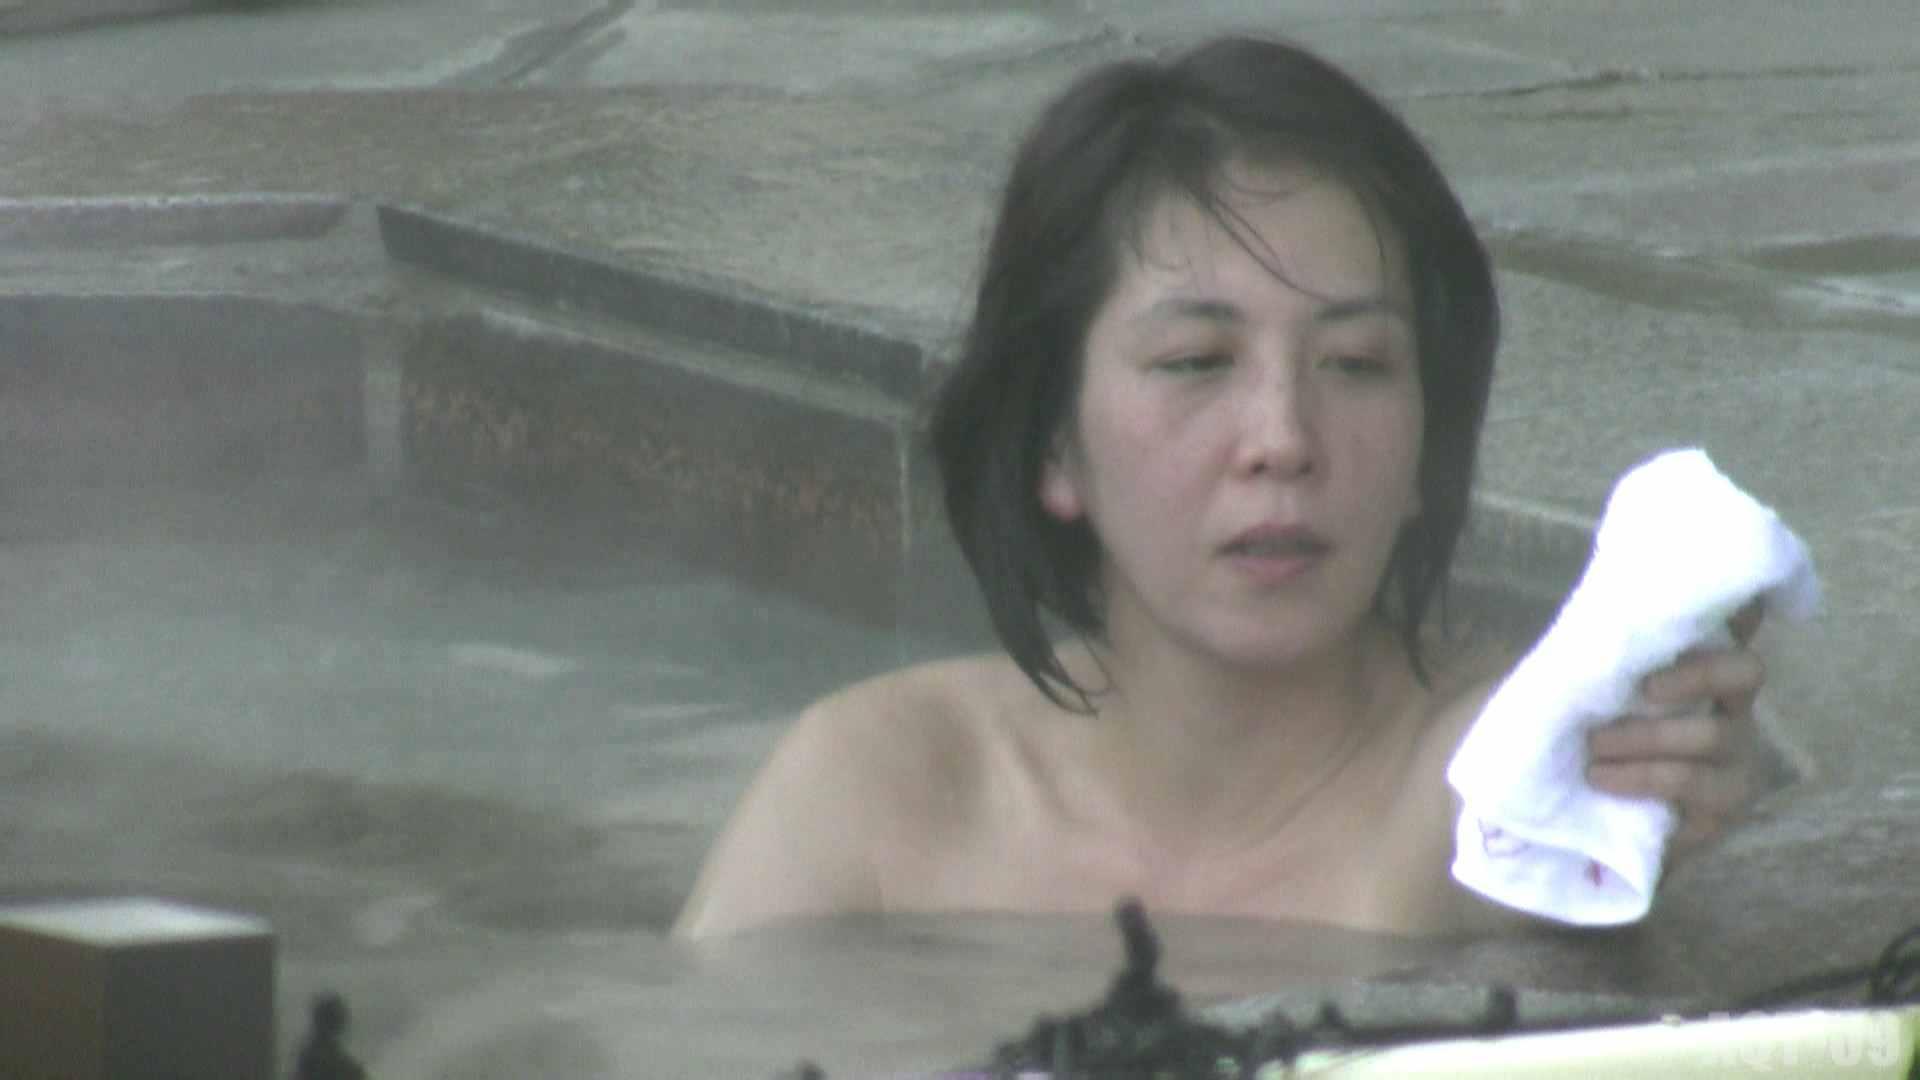 Aquaな露天風呂Vol.788 盗撮師作品  100pic 33